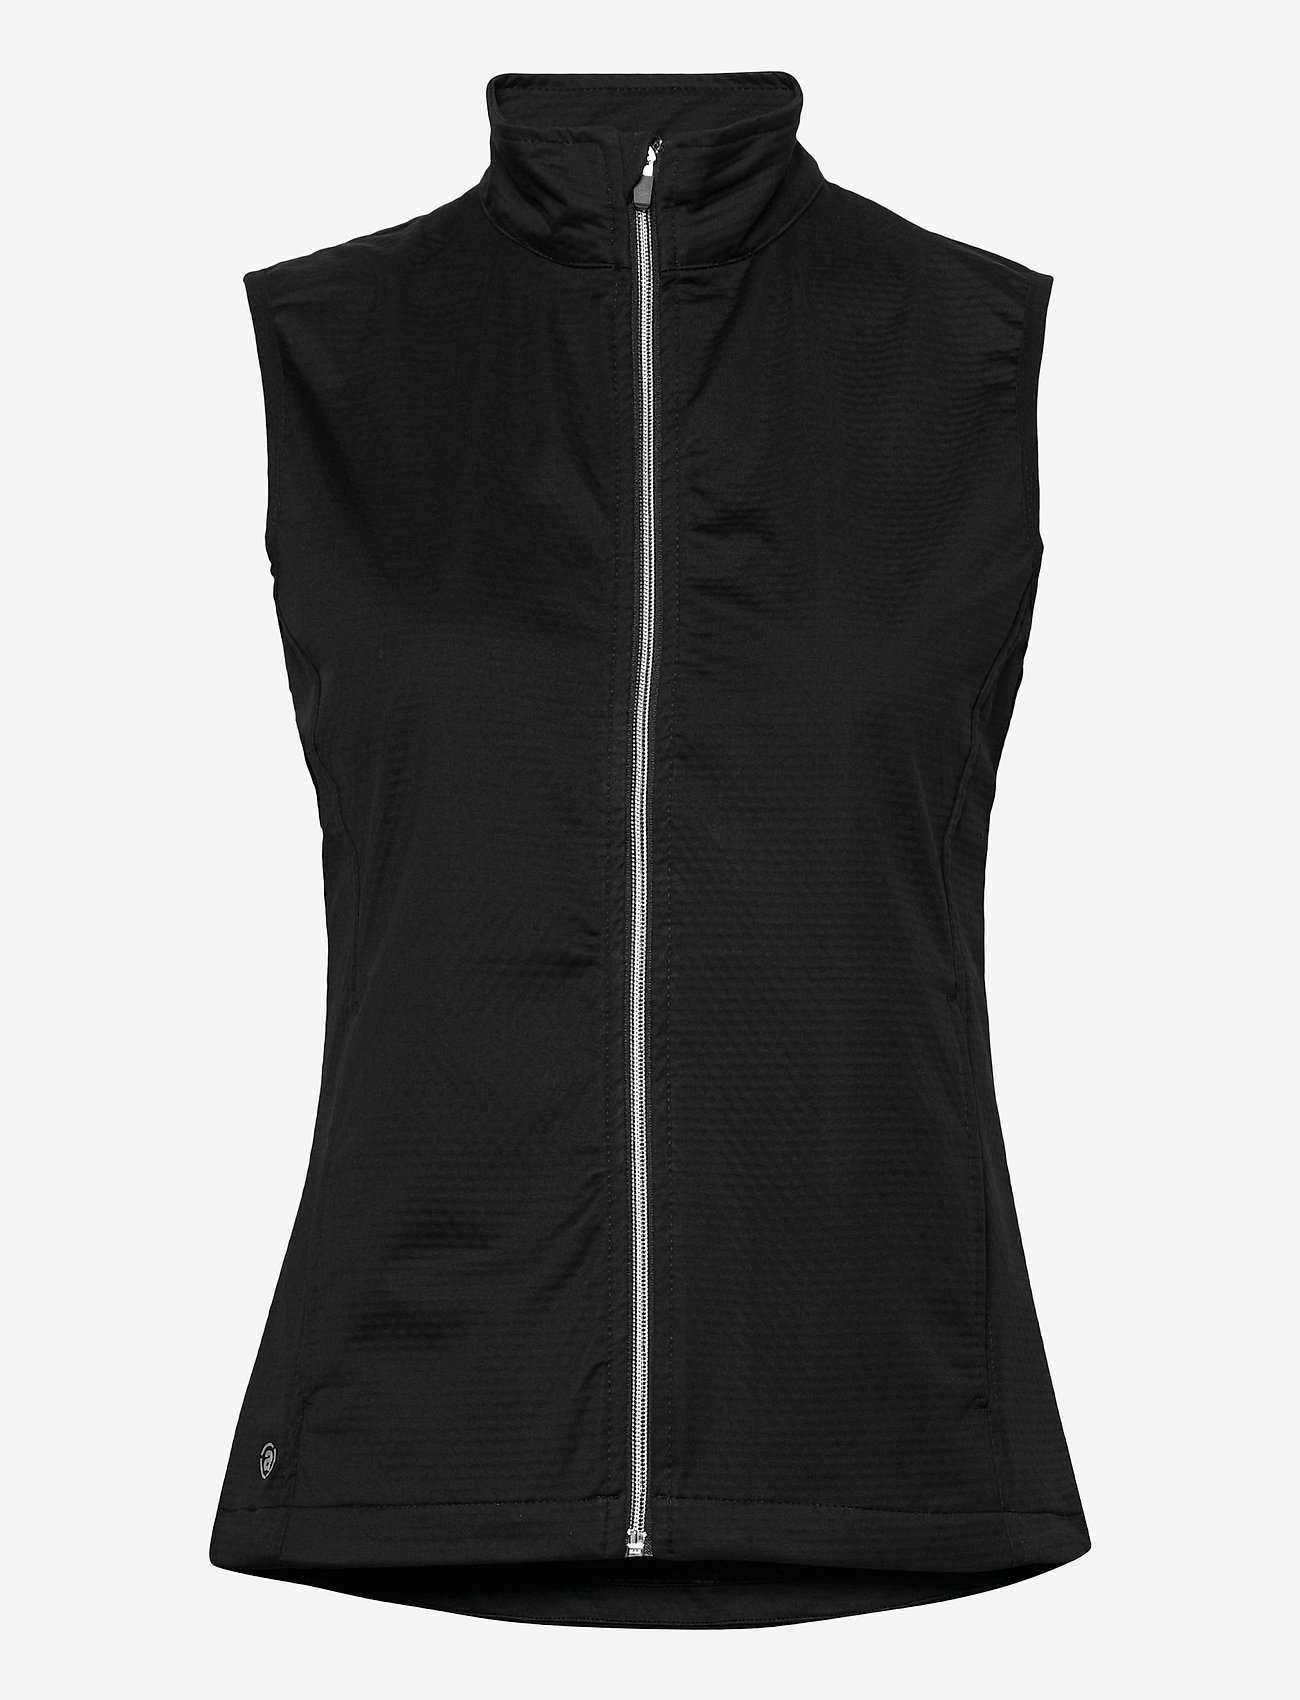 Abacus - Lds Lytham softshell vest - gevoerde vesten - black - 0